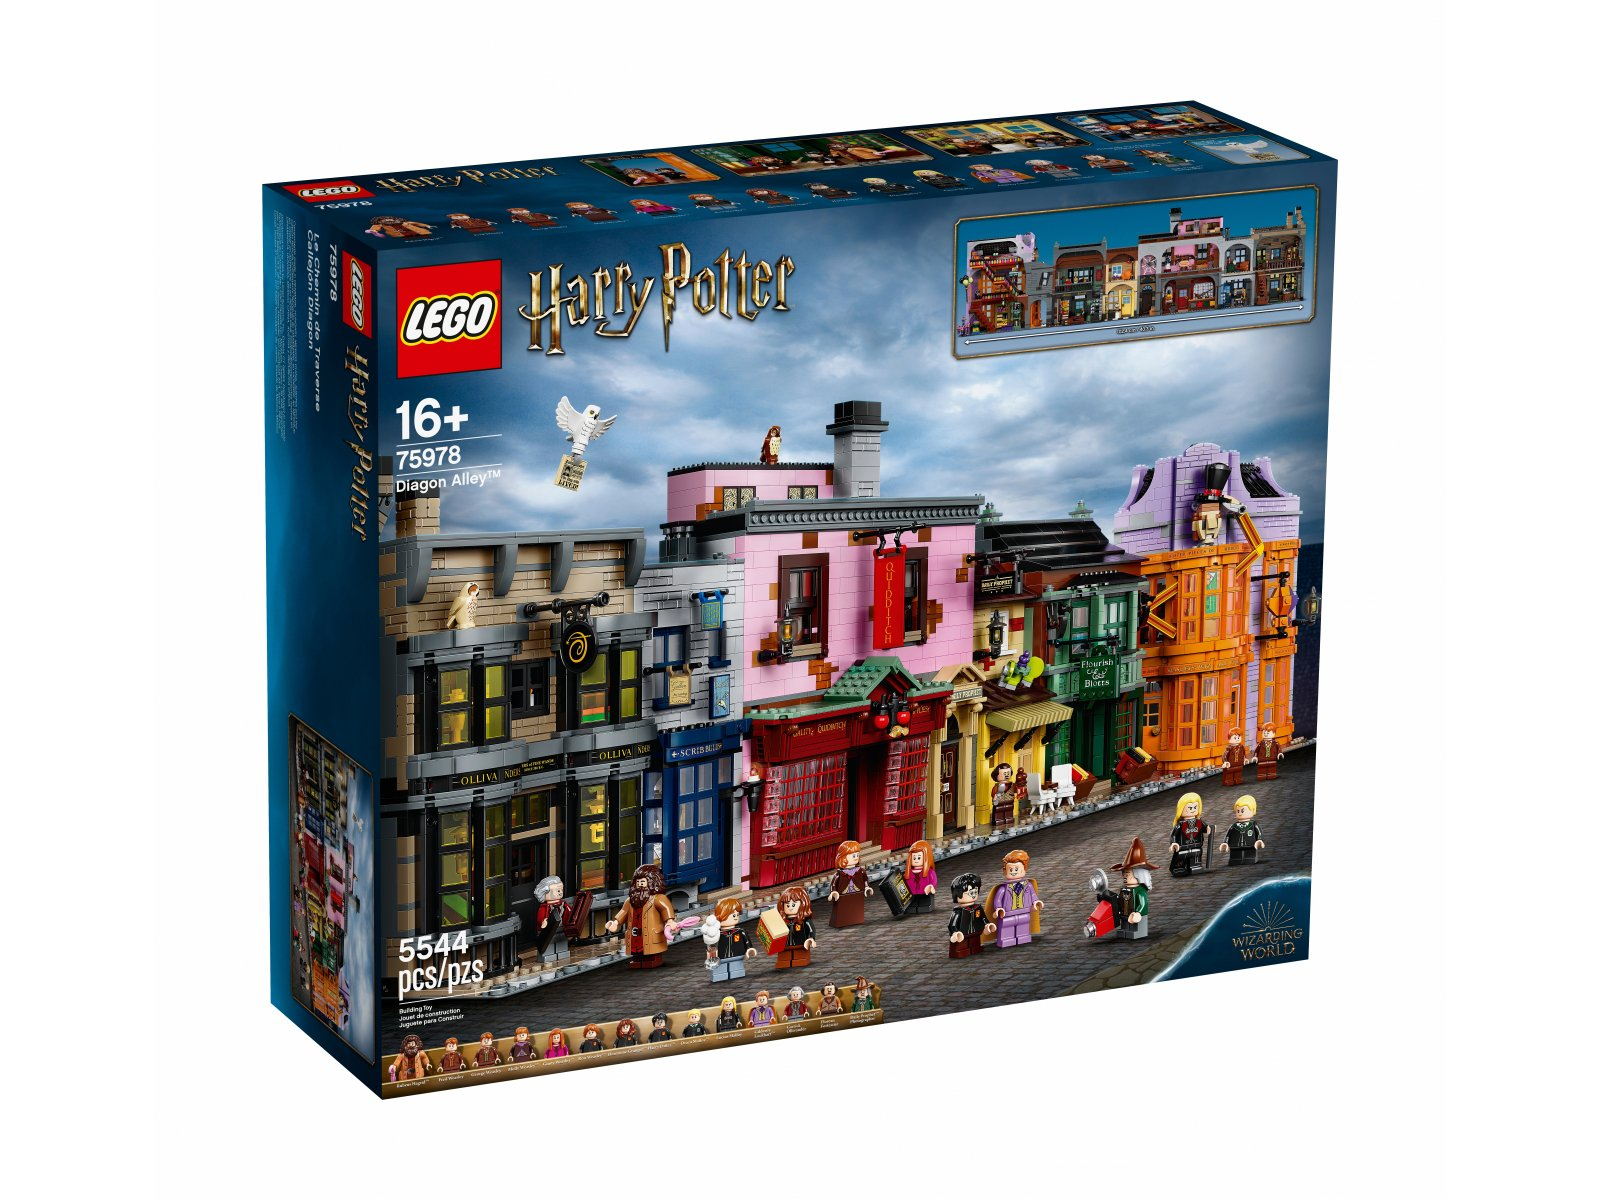 LEGO 75978 Harry Potter™ Ulica Pokątna™